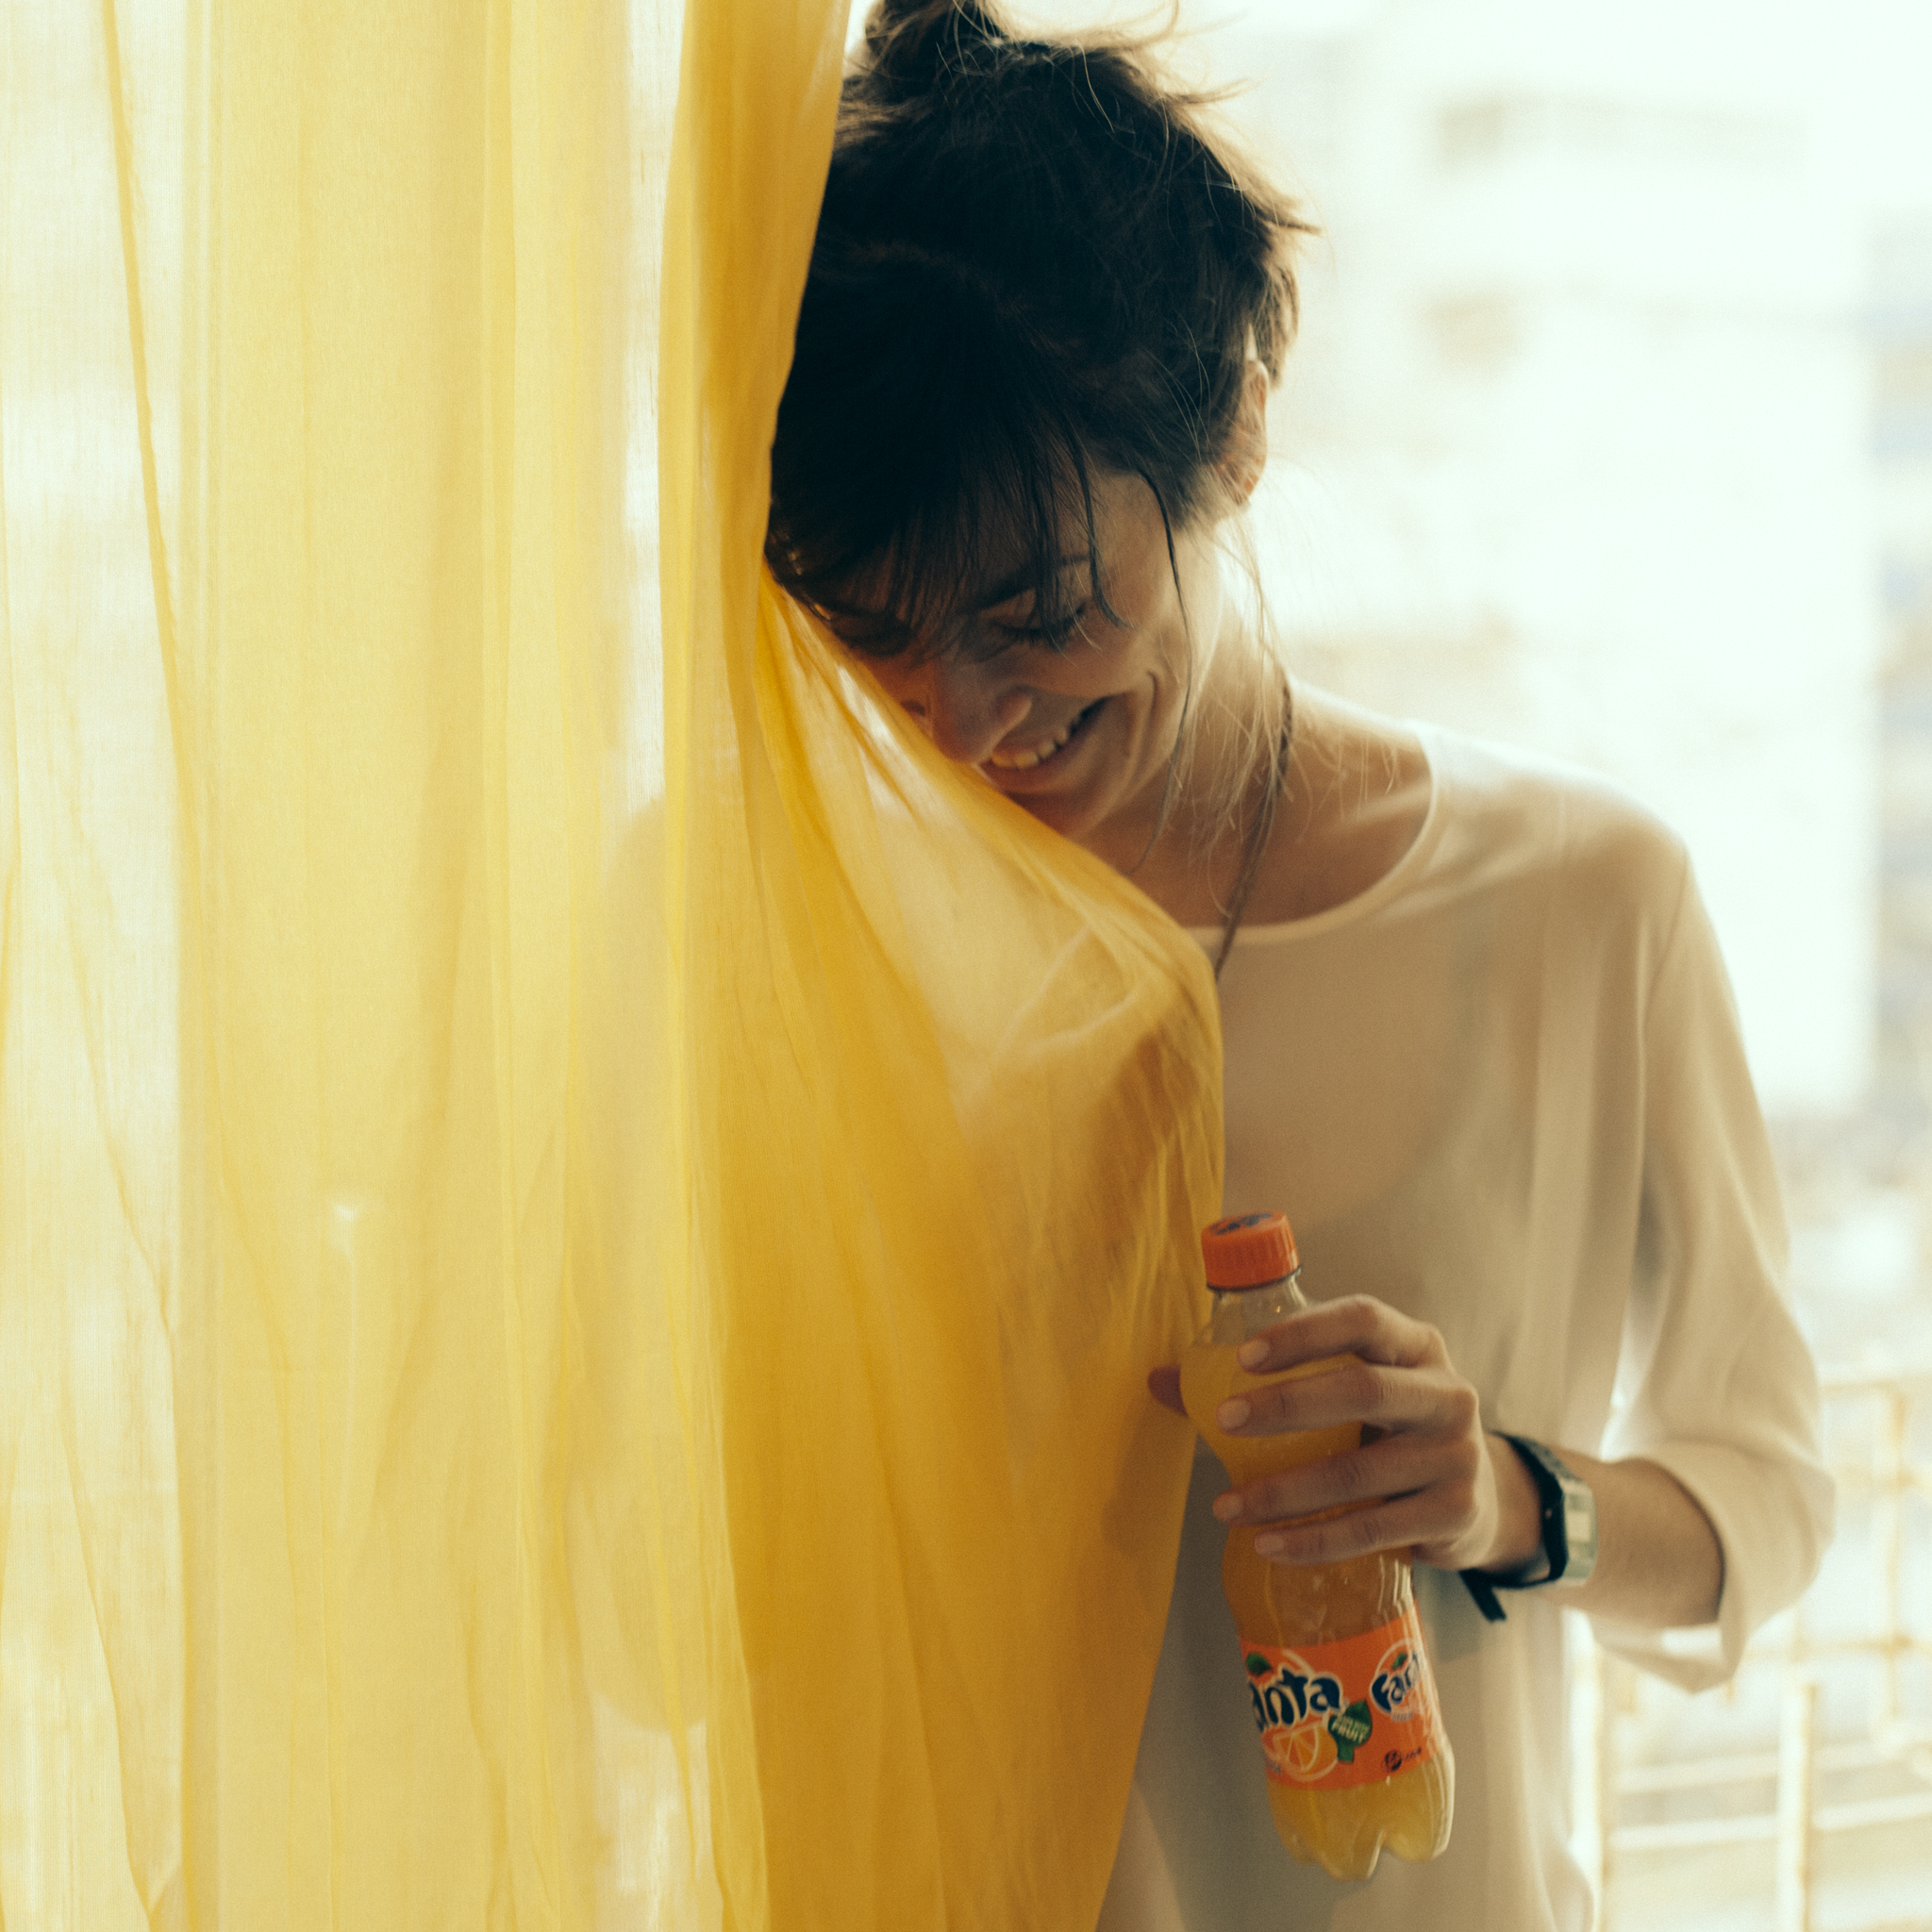 SE_Vice_CocaCola_0147.jpg